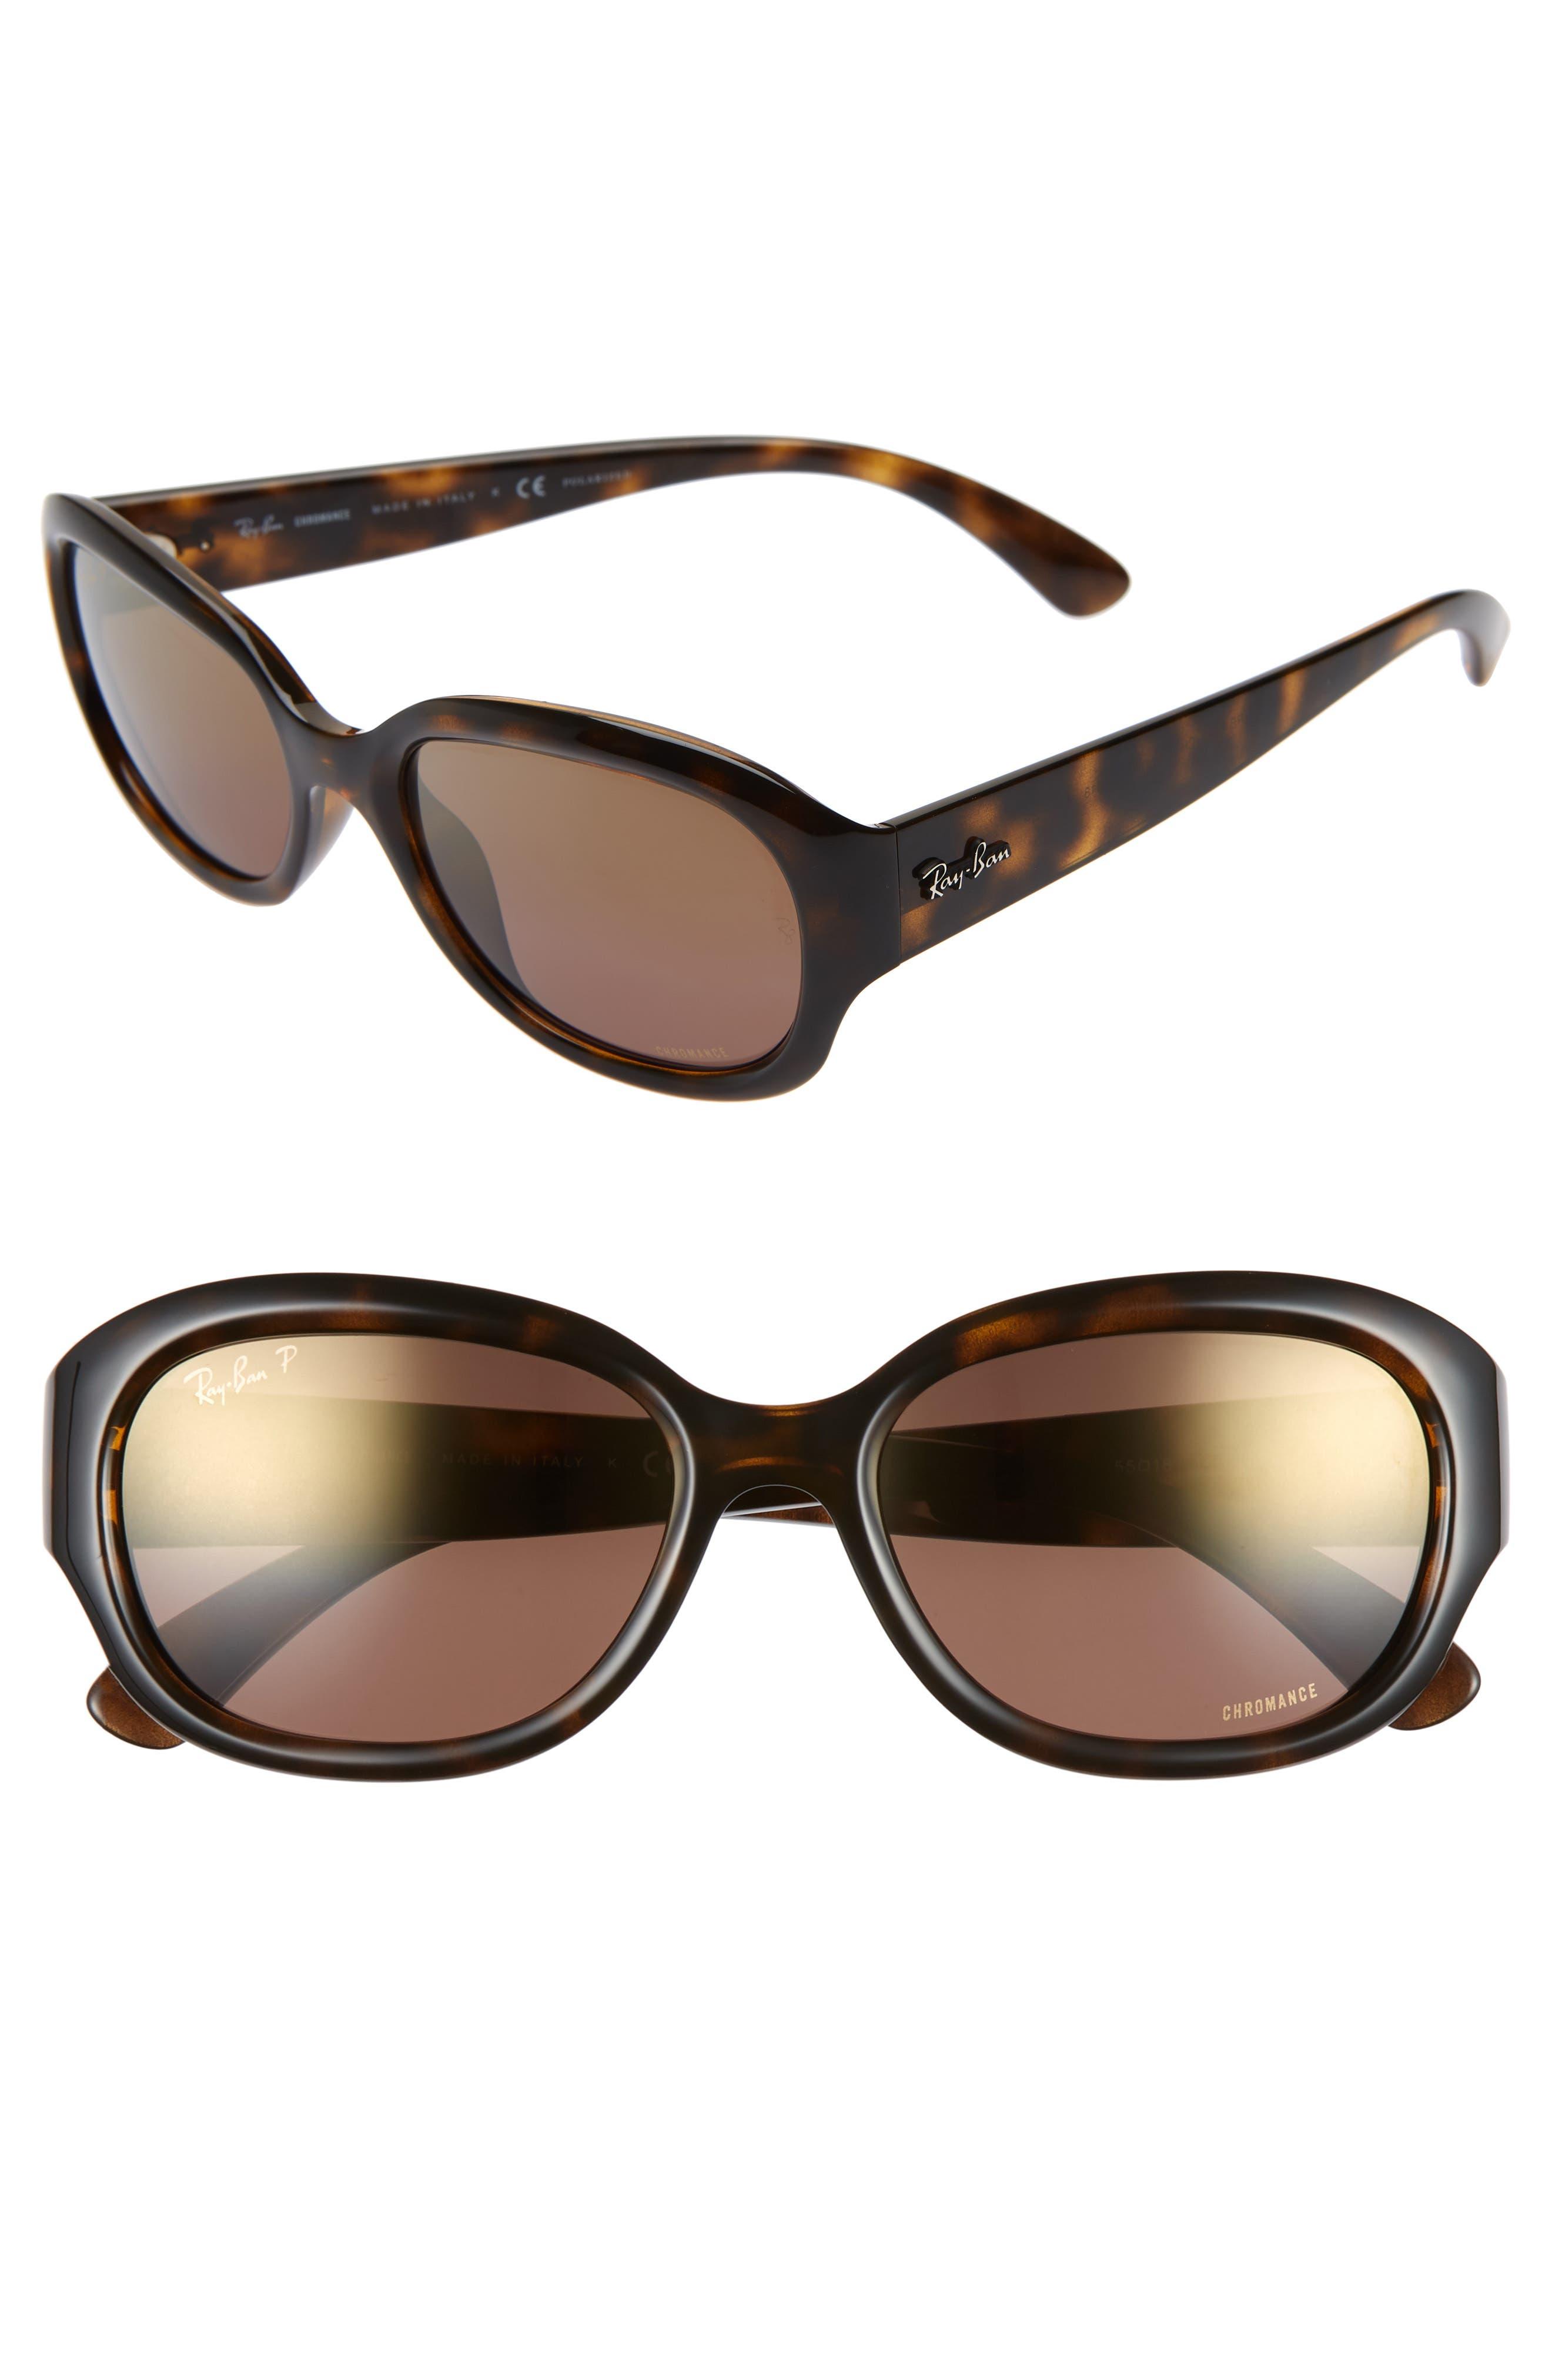 Ray-Ban 55Mm Chromance Polarized Sunglasses - Havana/ Gradient Mirror